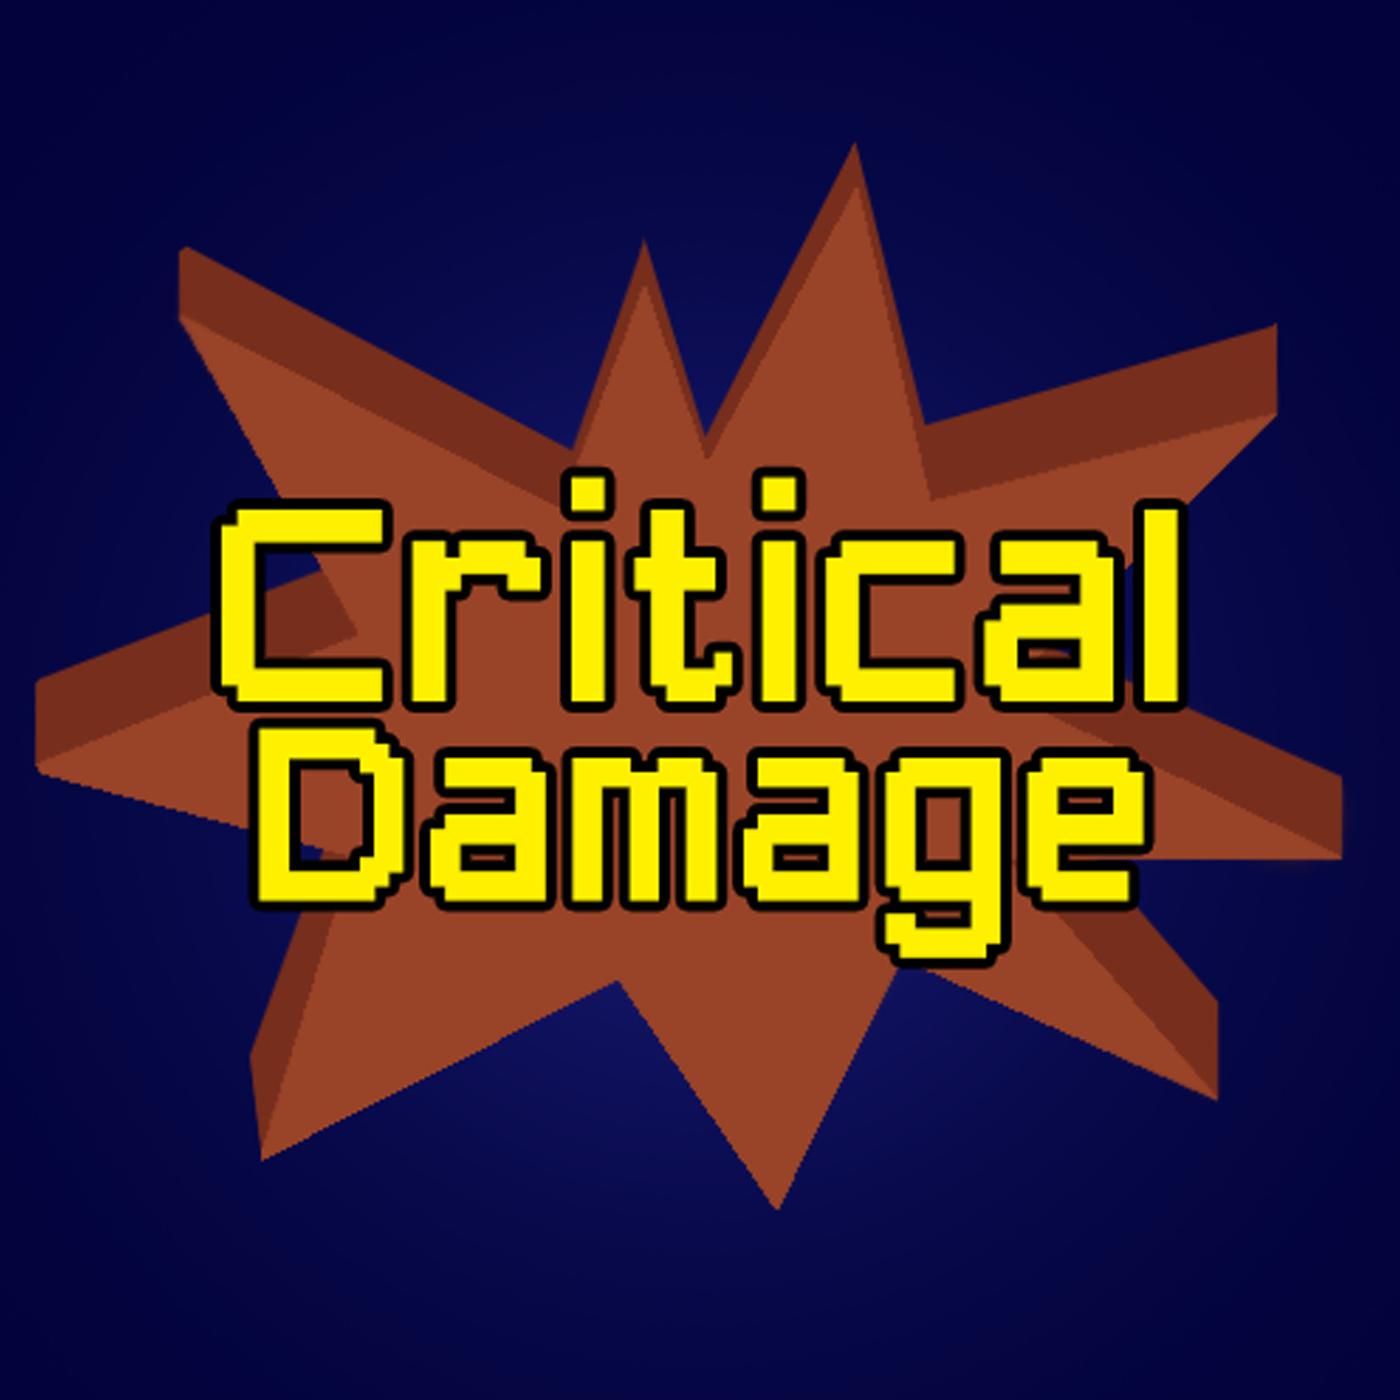 critical-damage-critical-damage-xXH1DusI